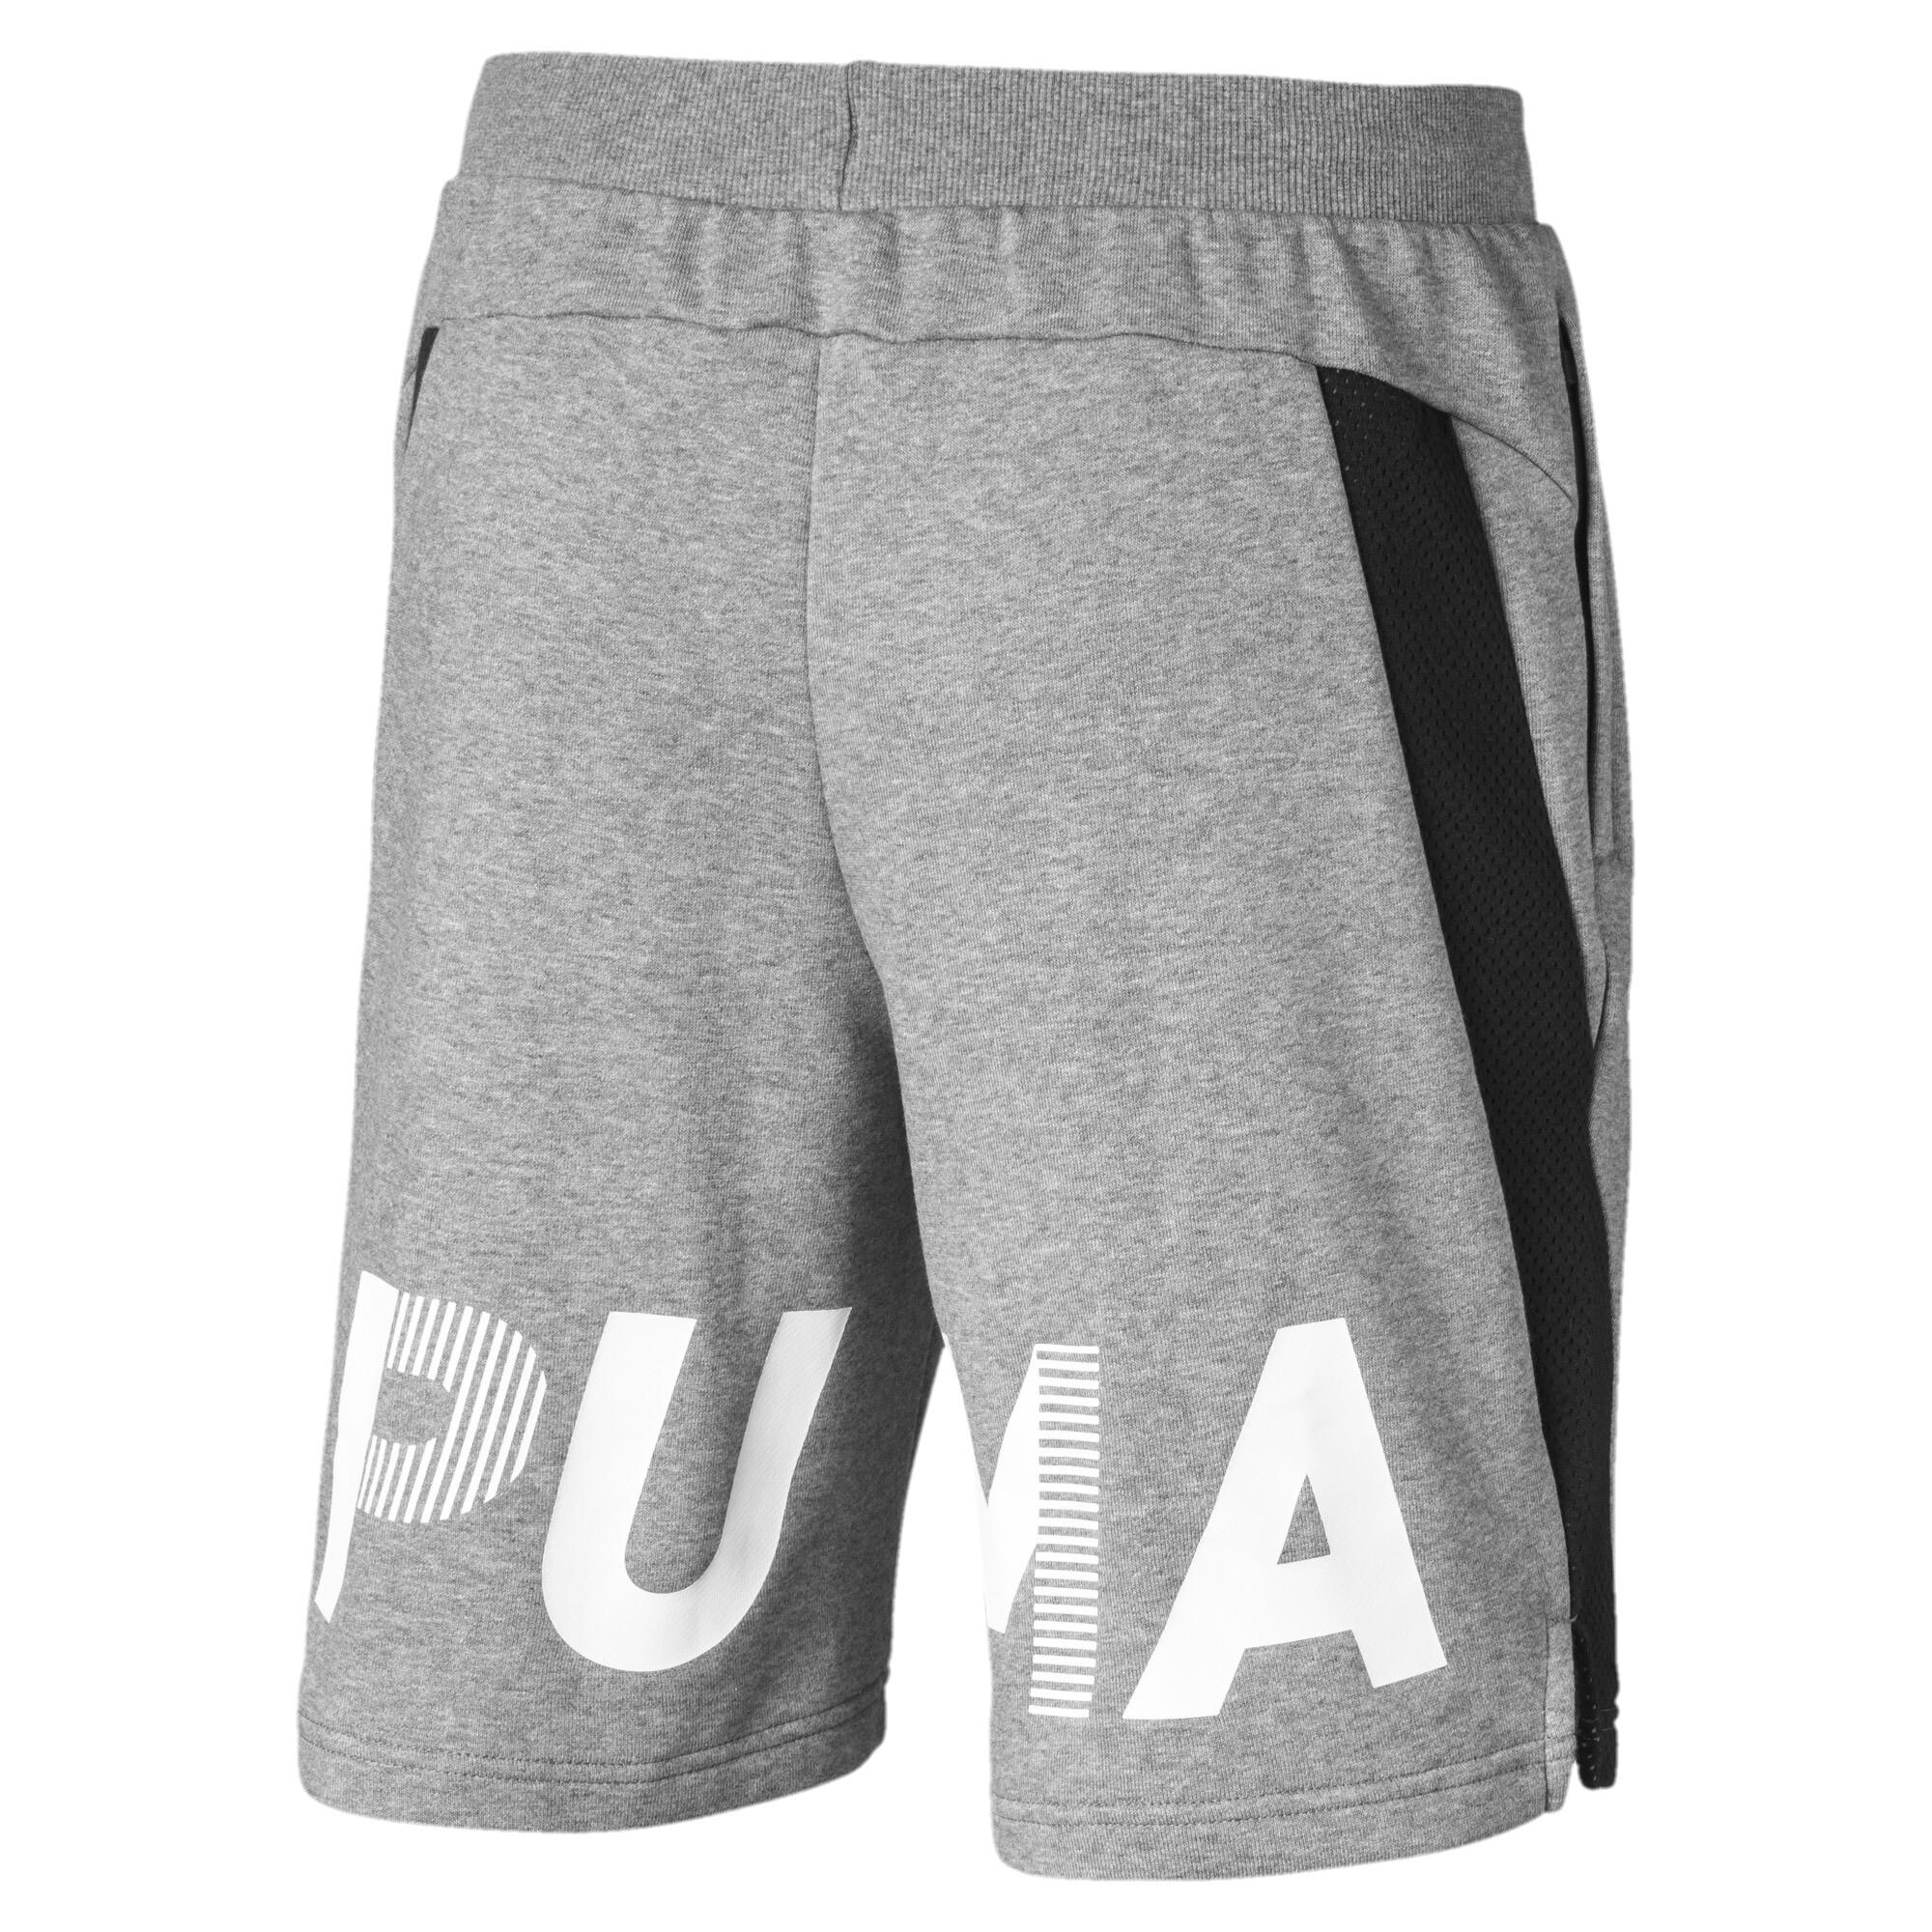 PUMA-Modern-Sports-Men-039-s-Shorts-Men-Knitted-Shorts-Basics thumbnail 8